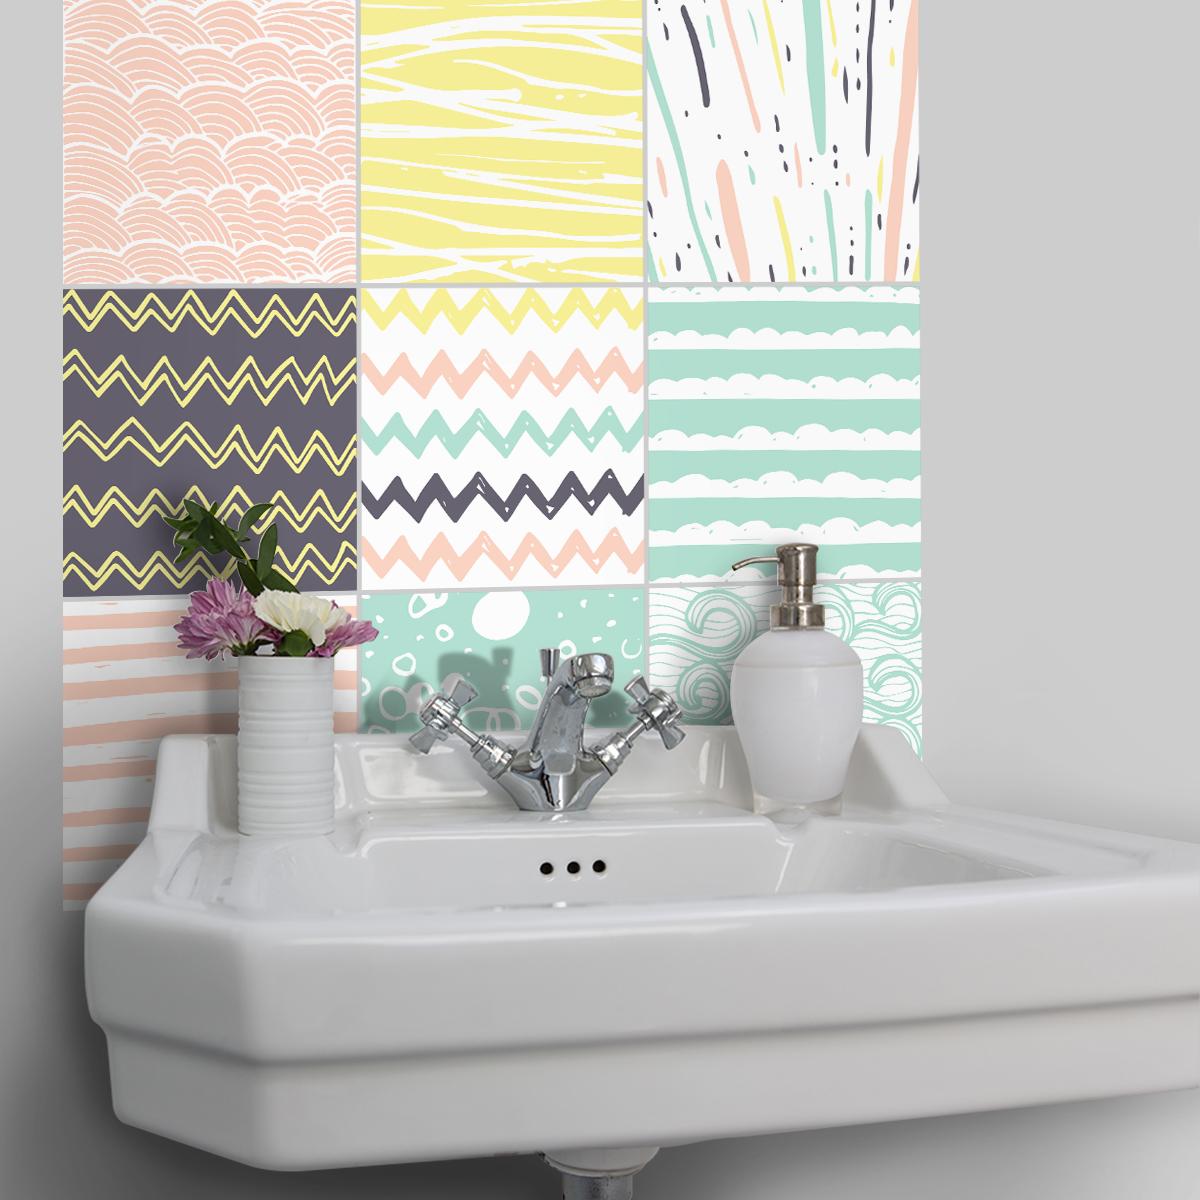 9 stickers carreaux de ciment azulejos sabatino cuisine carrelages ambiance sticker. Black Bedroom Furniture Sets. Home Design Ideas